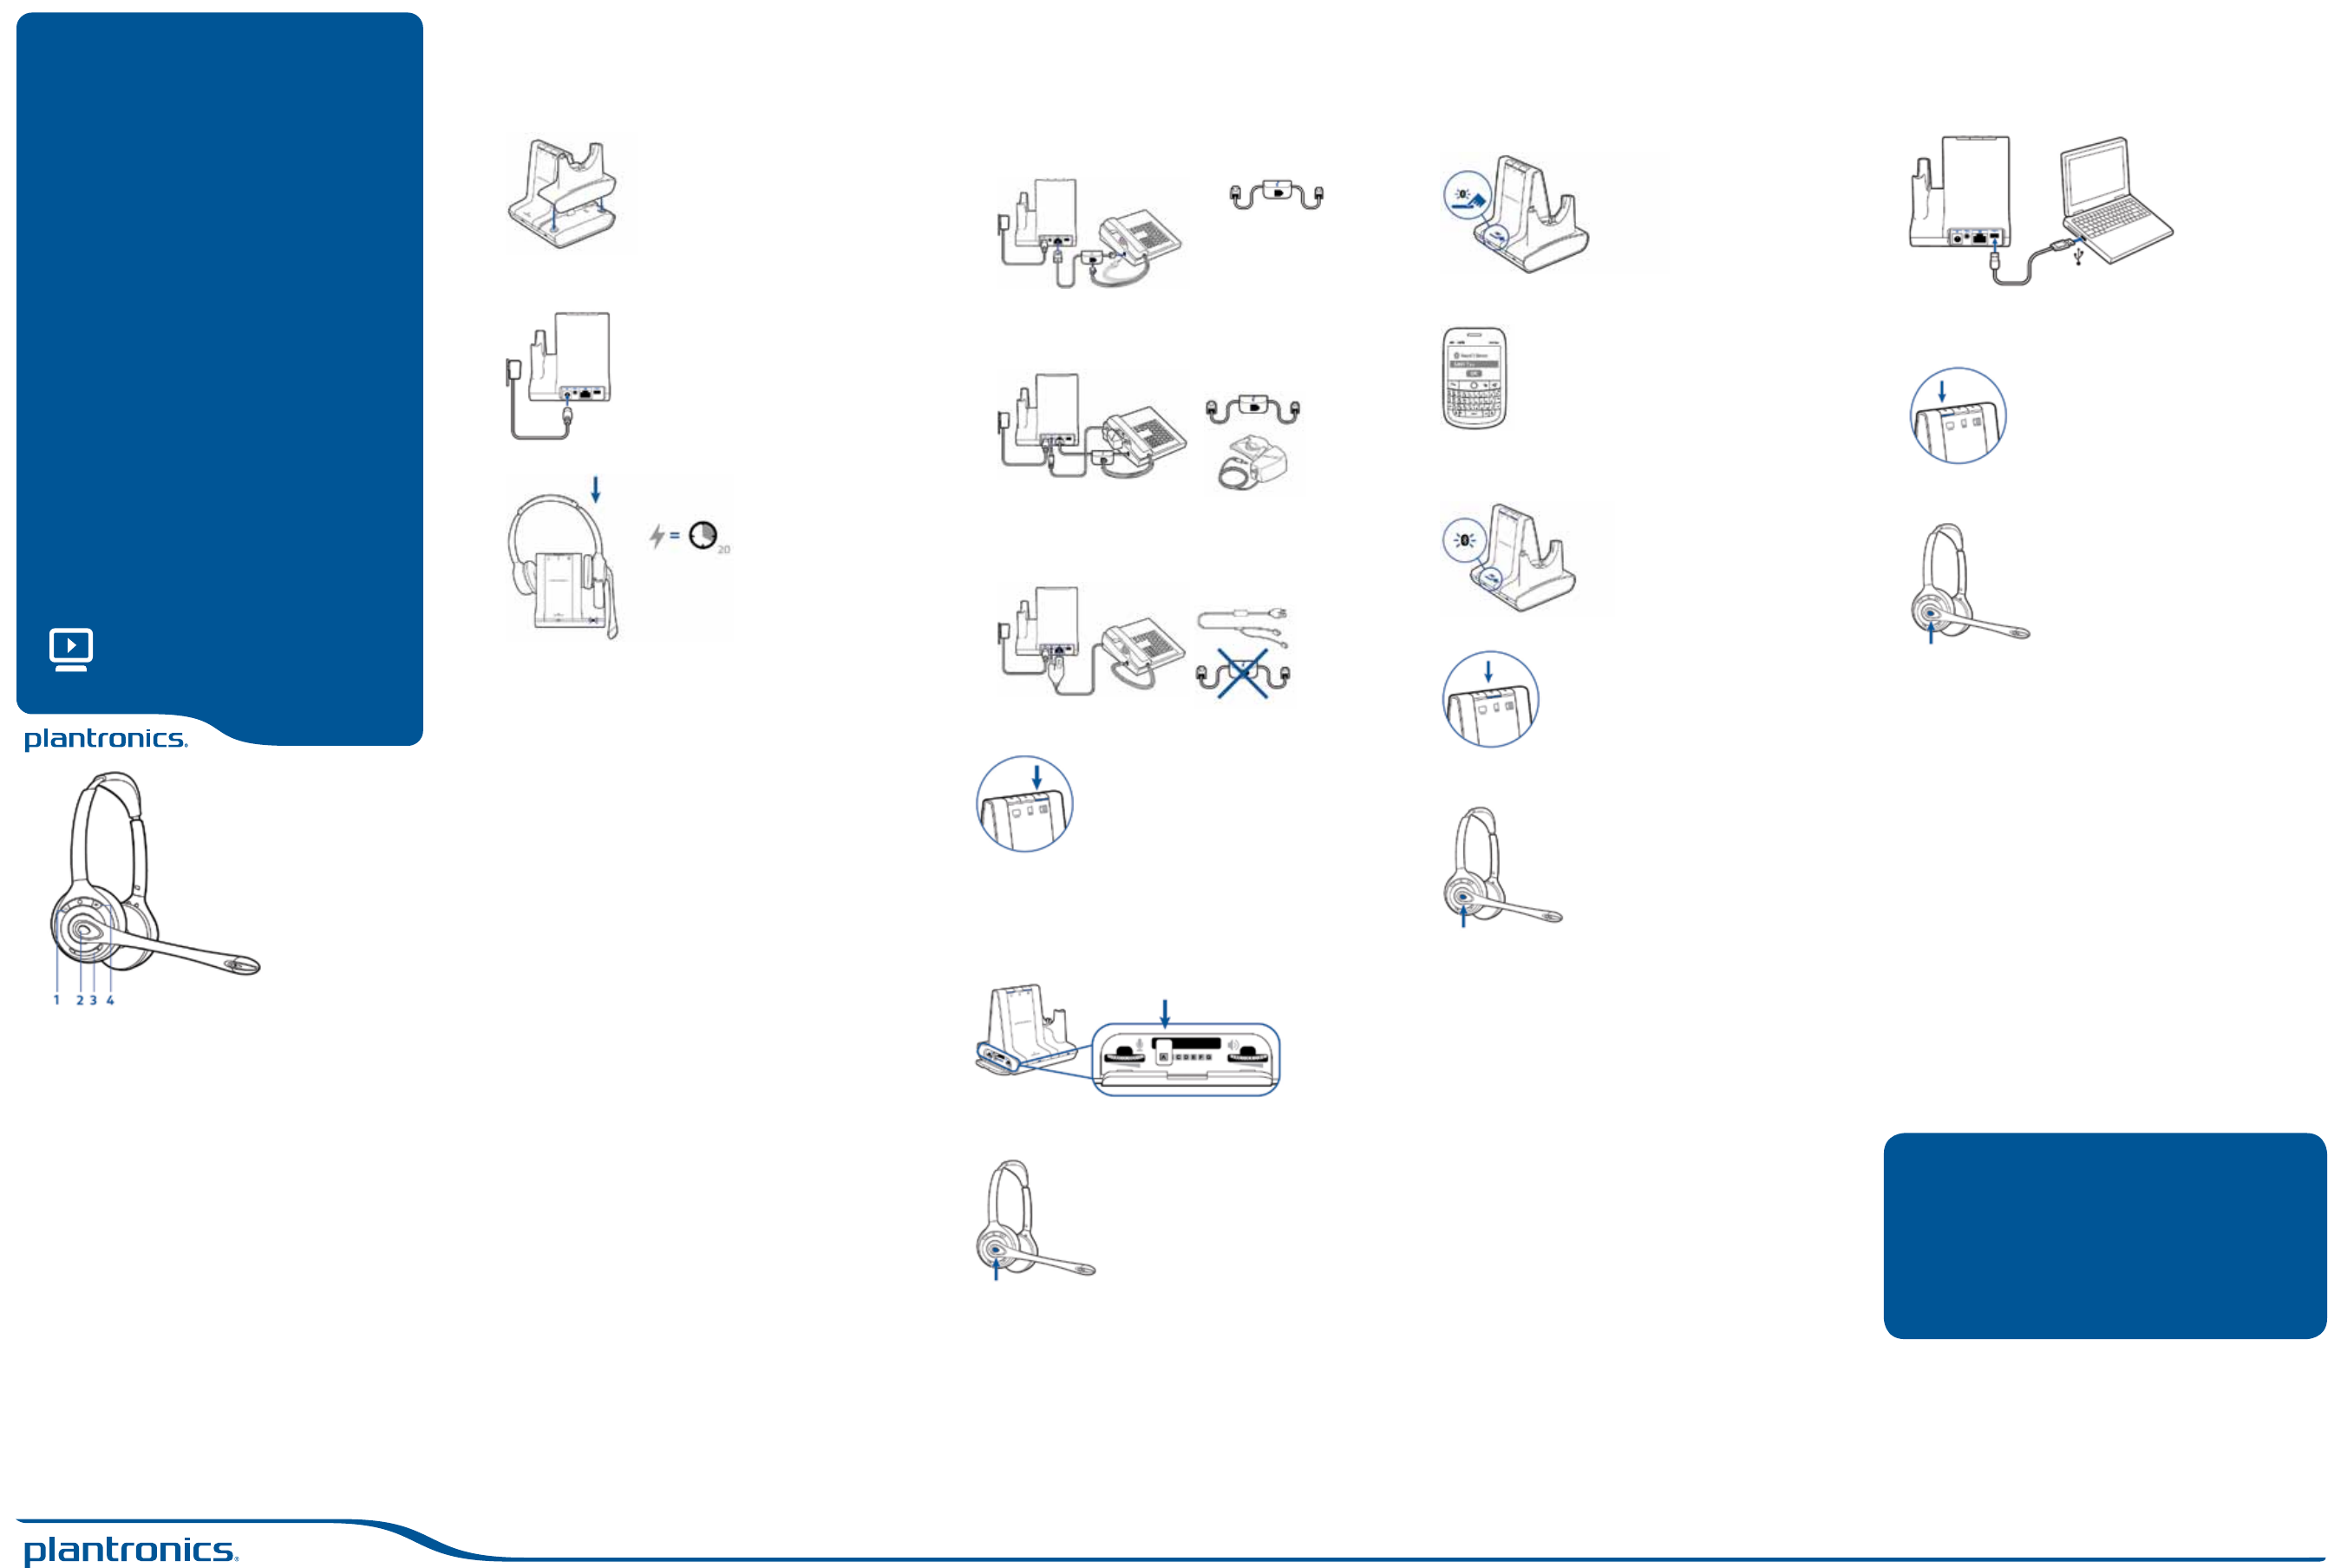 Plantronics Headphones W710A Users Manual